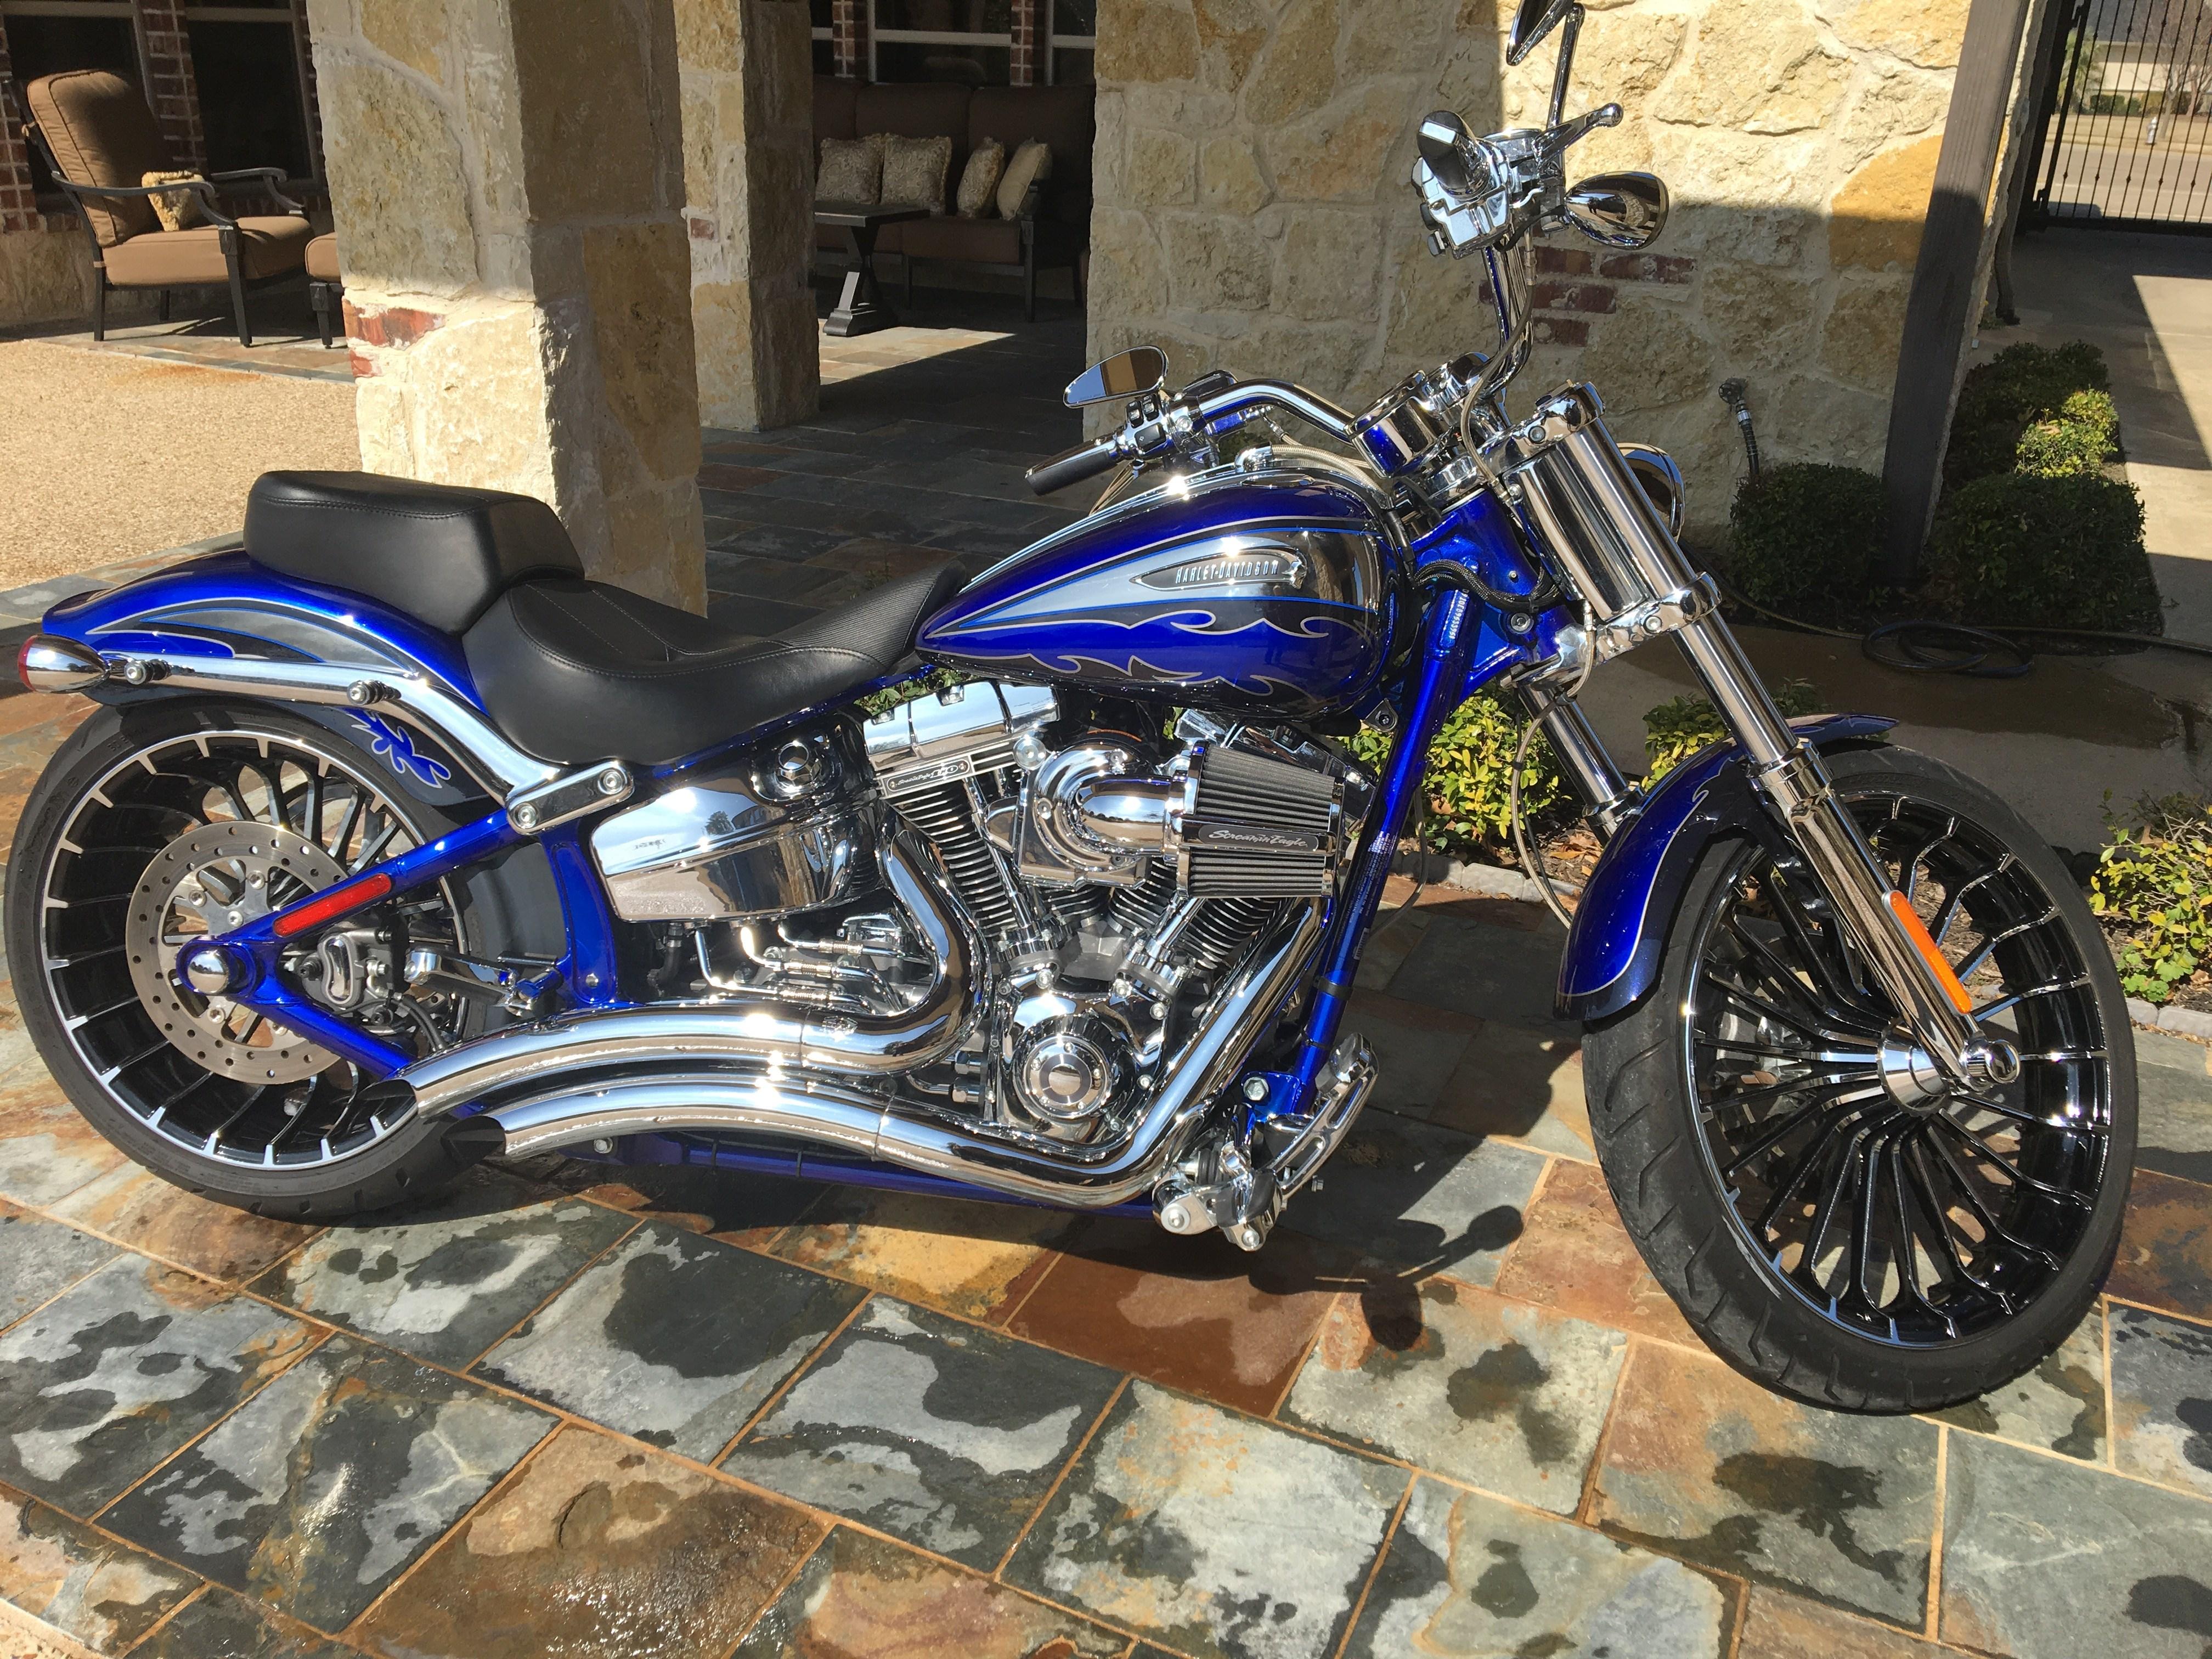 2014 Harley Davidson 174 Fxsbse Cvo Breakout Candy Cobalt